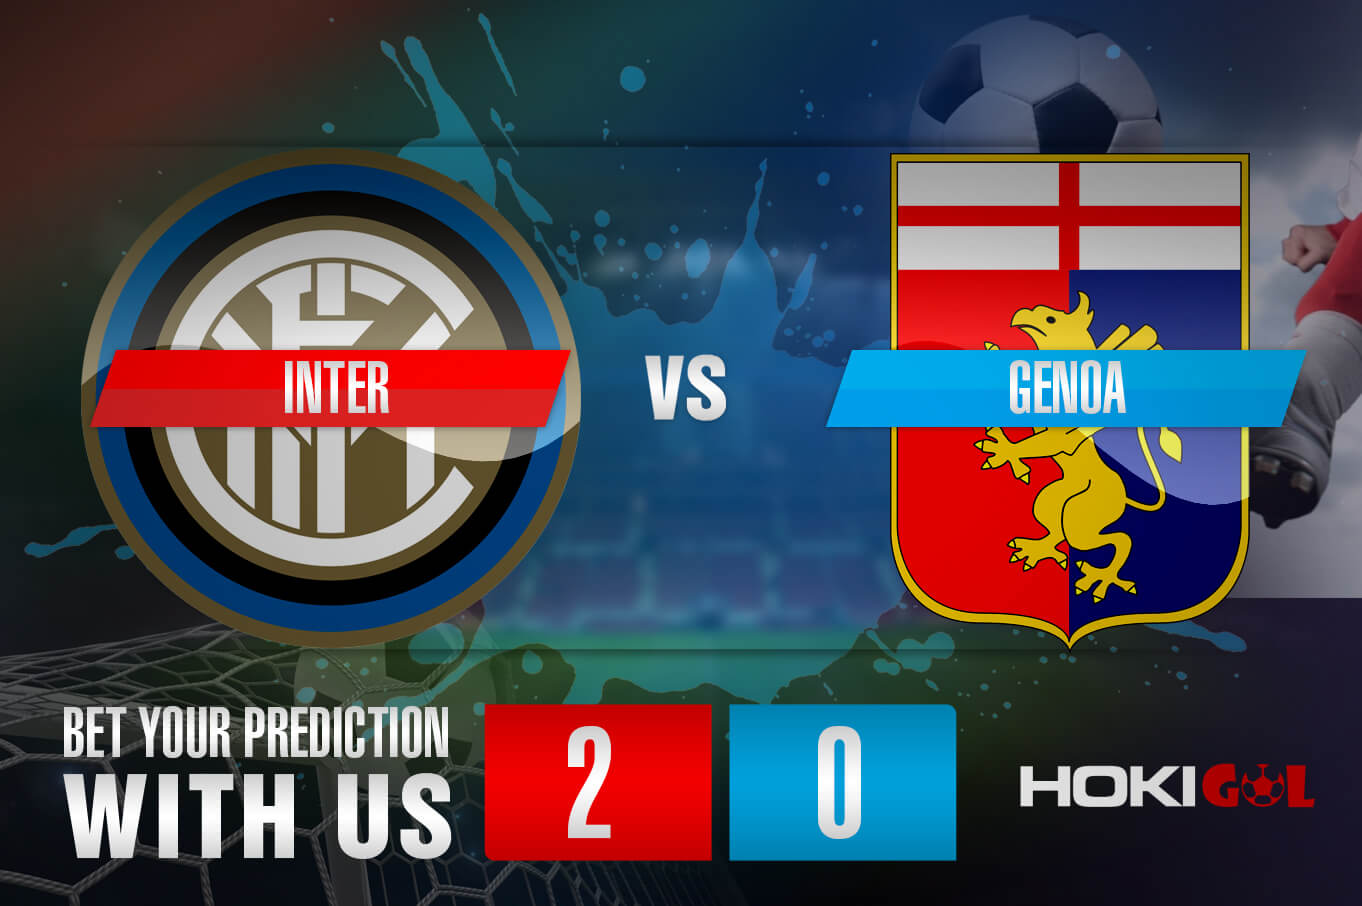 Prediksi Bola Inter Vs Genoa 28 Februari 2021